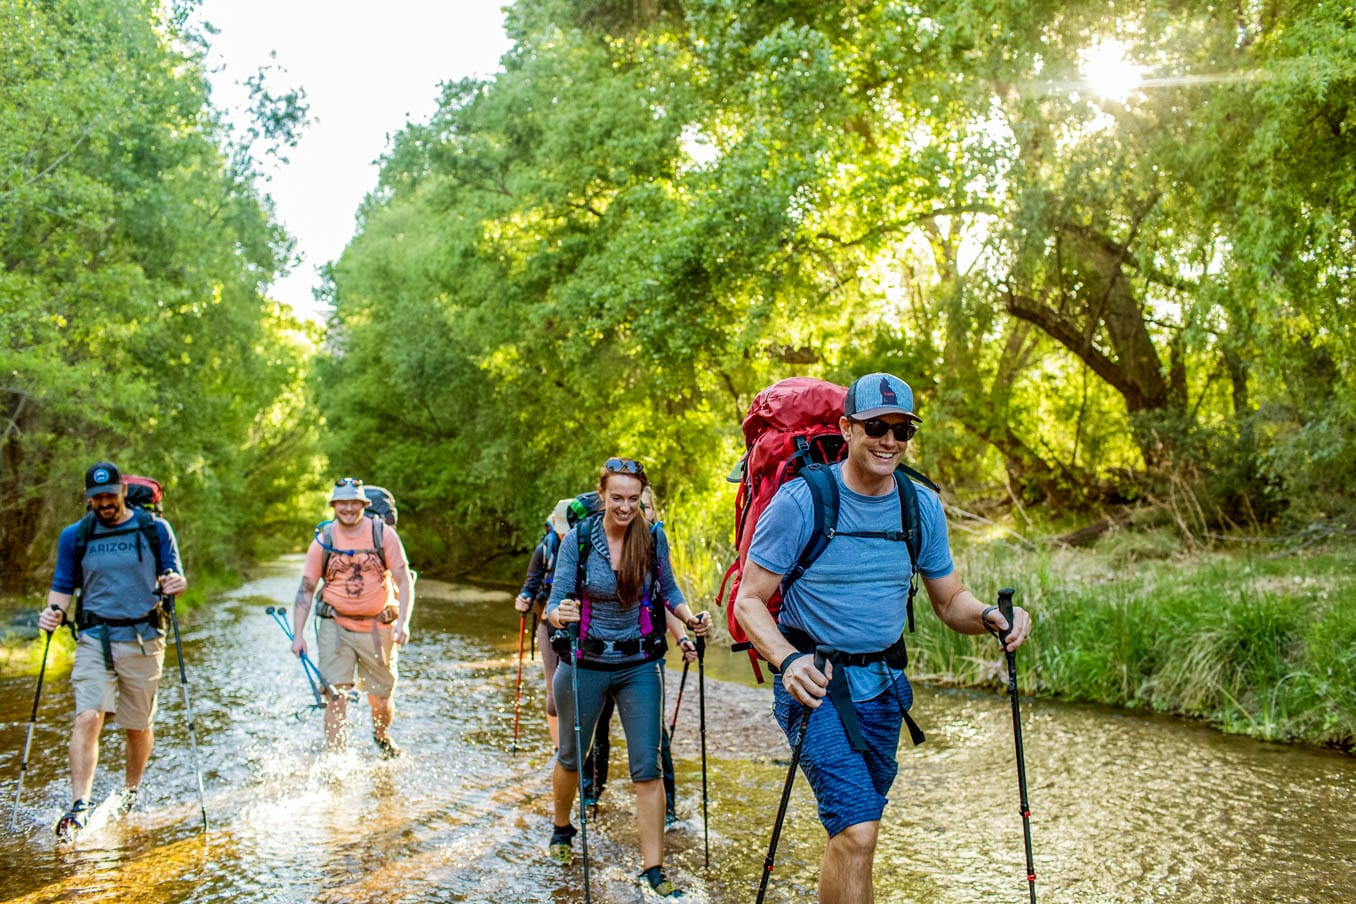 Hiking group wades through river on Aravaipa Canyon trip